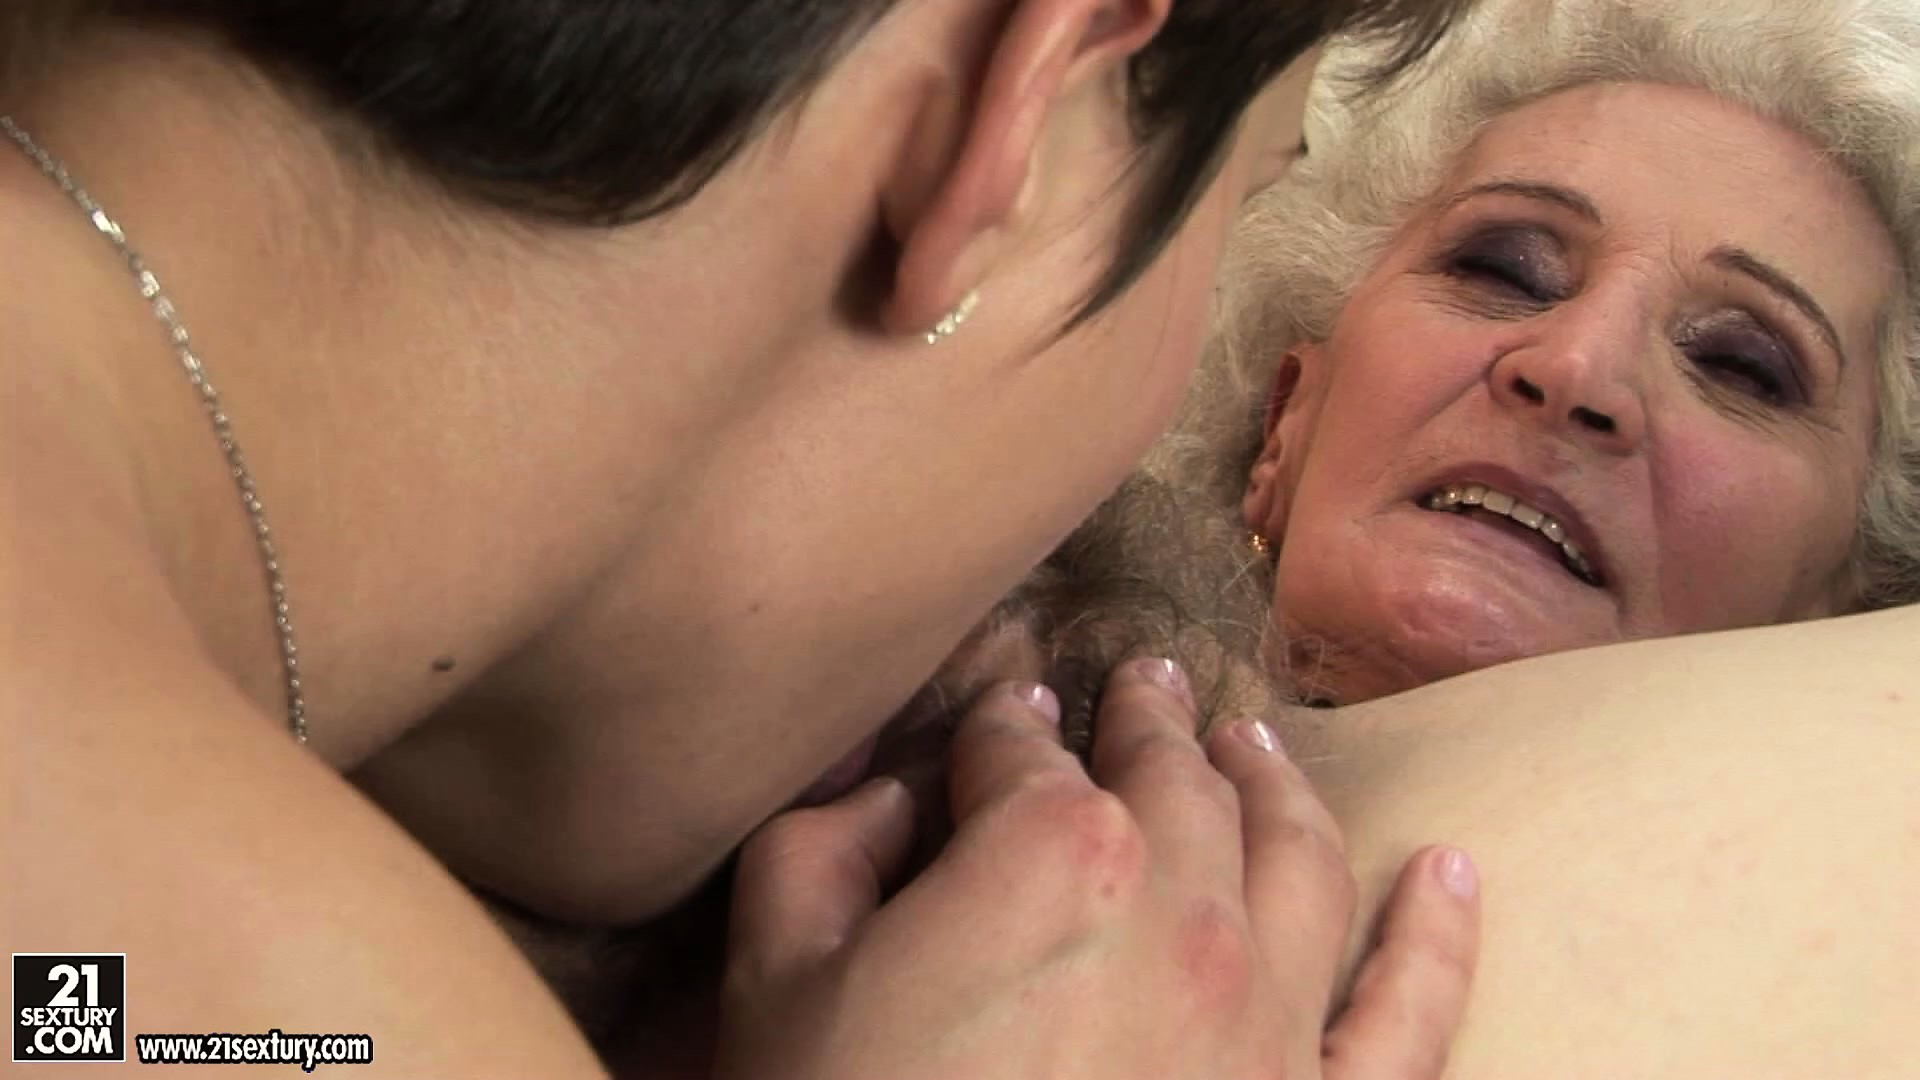 Порно видео онлайн на Pornokaif.net.